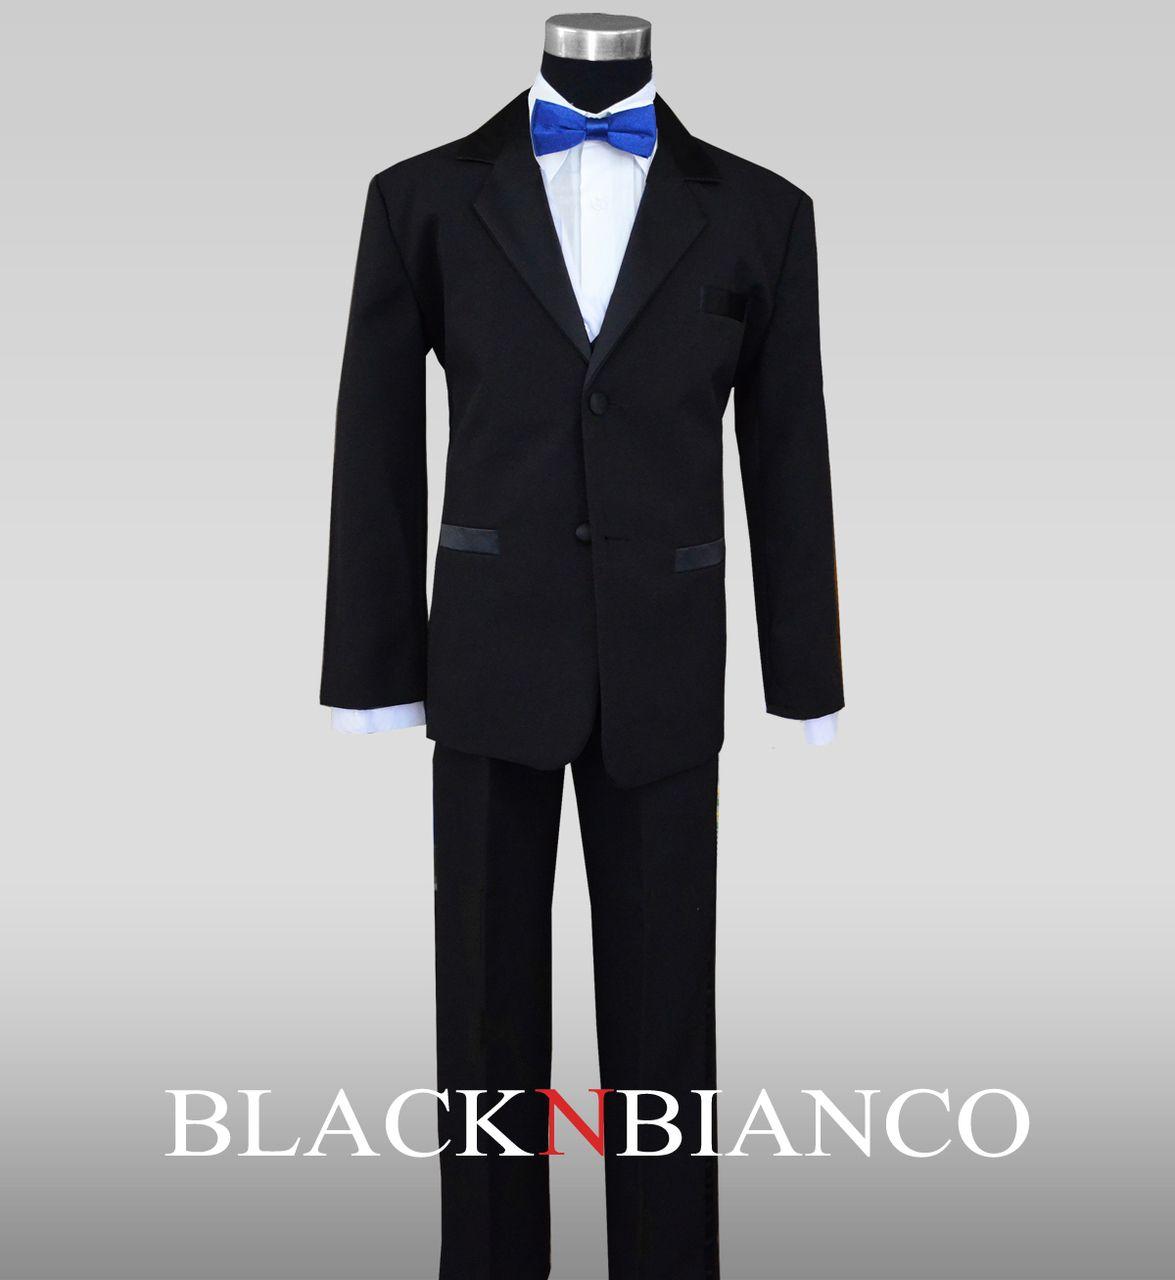 Boys Tuxedo with Royal Blue Slim Bow Tie   Pinterest ...